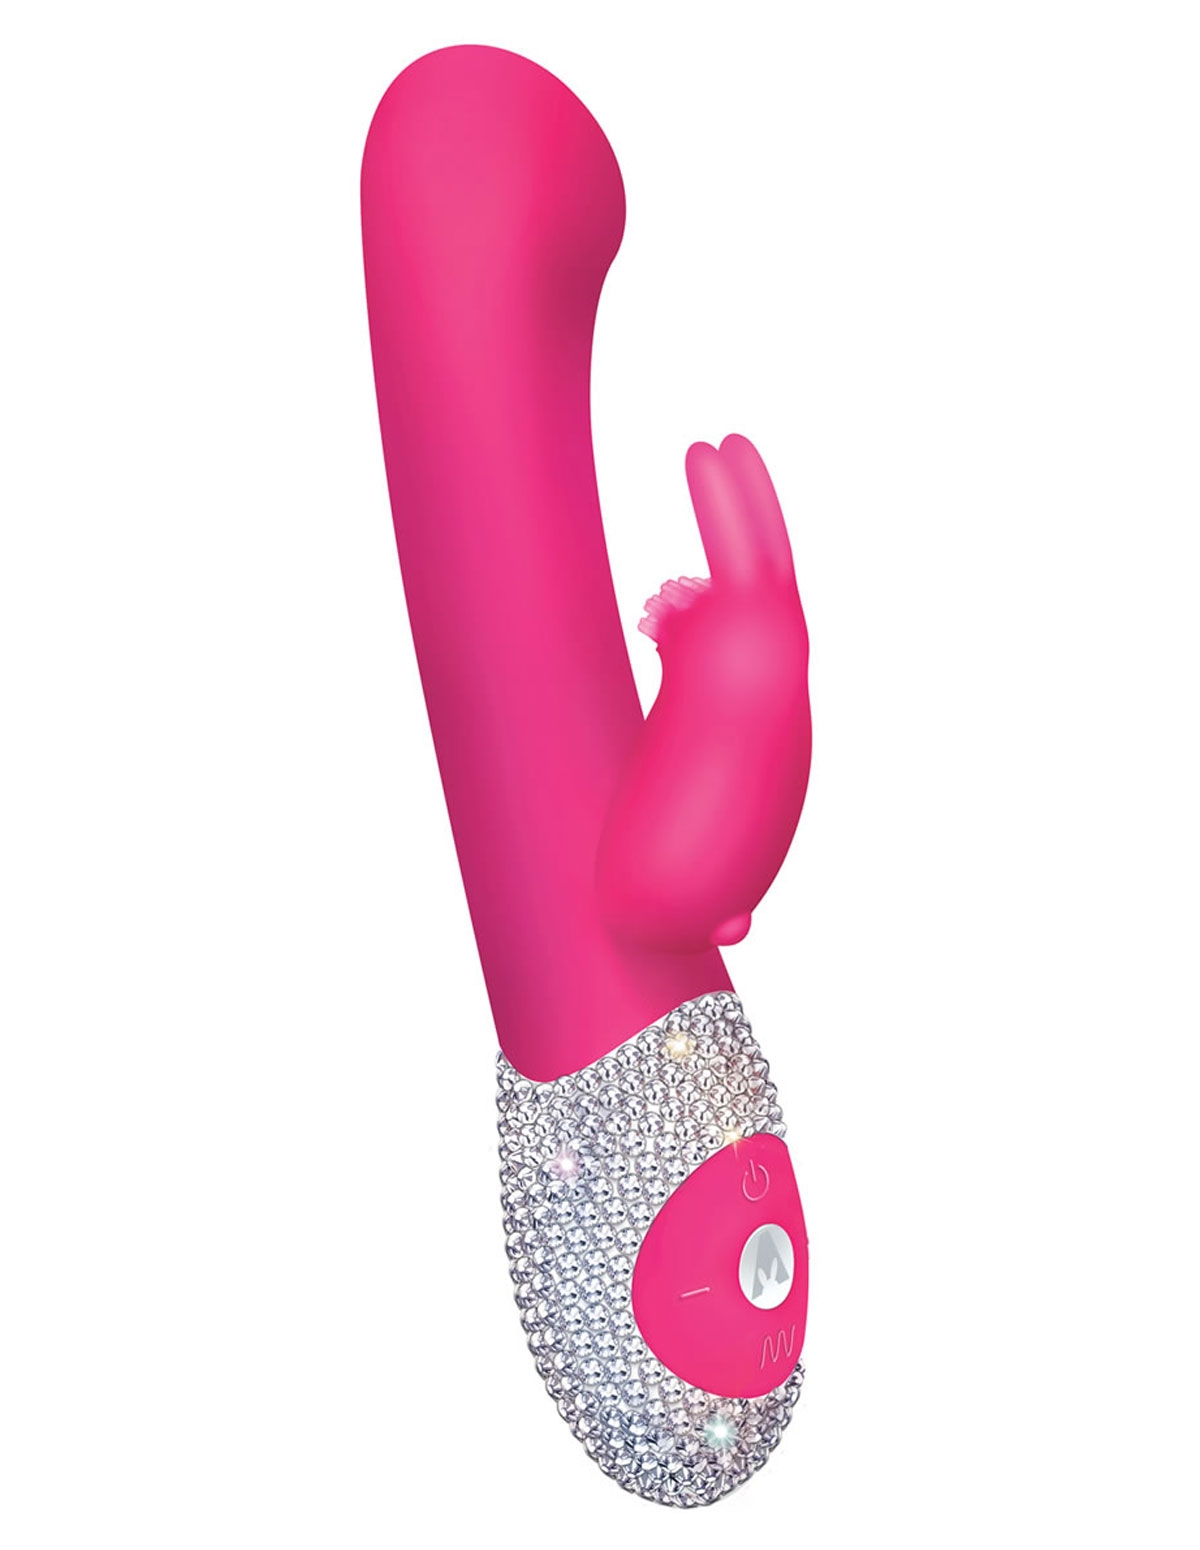 The G-Spot Bling Rabbit Vibrator